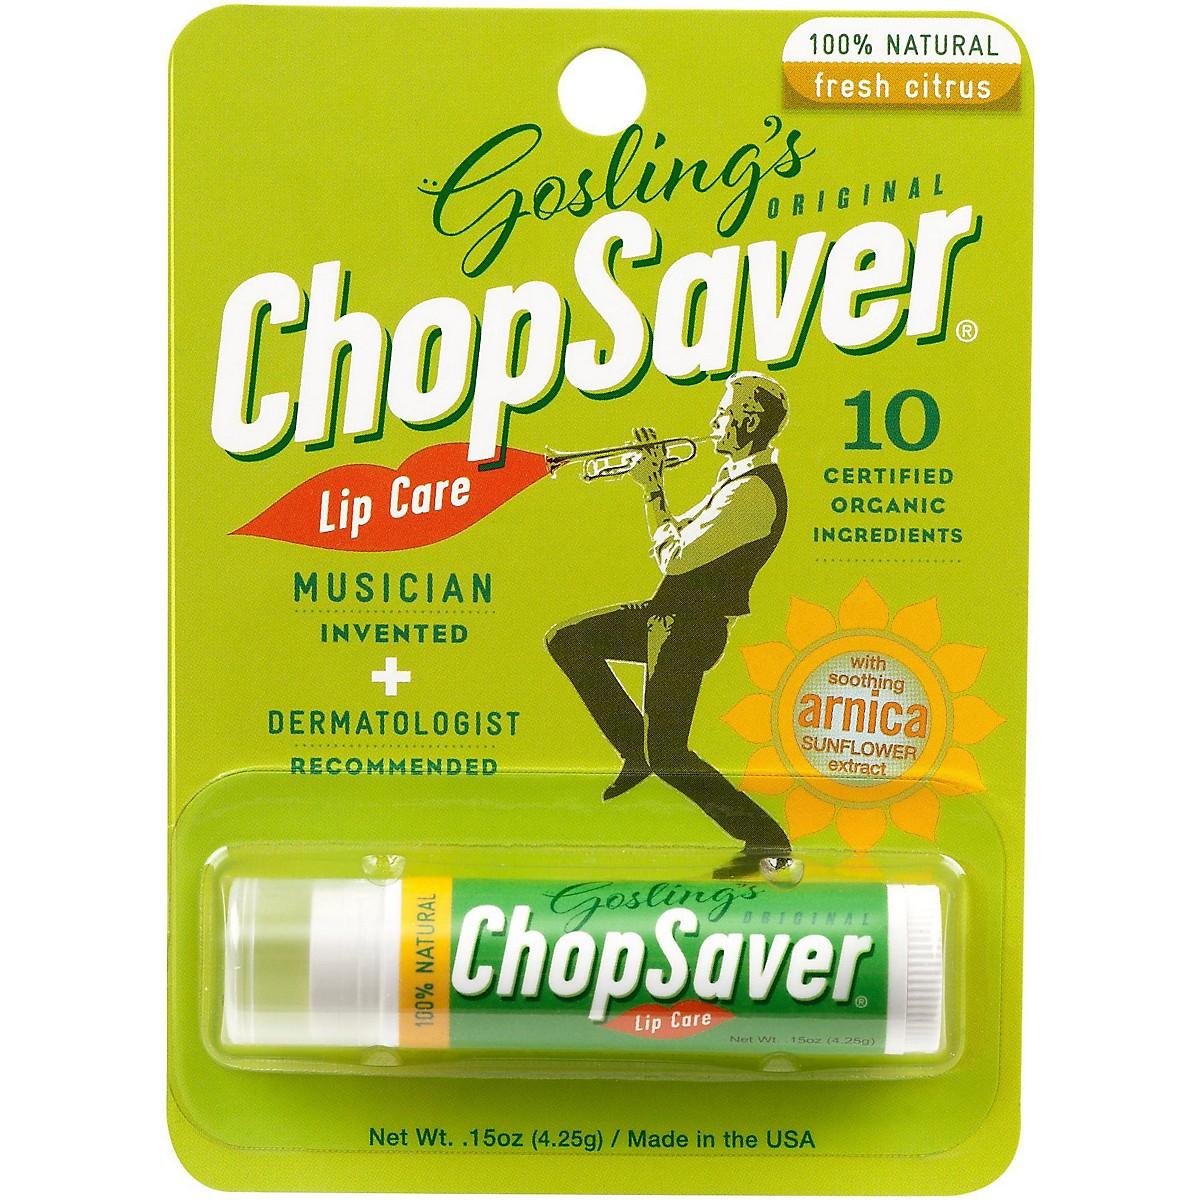 ChopSaver Lip Balm for Musicians